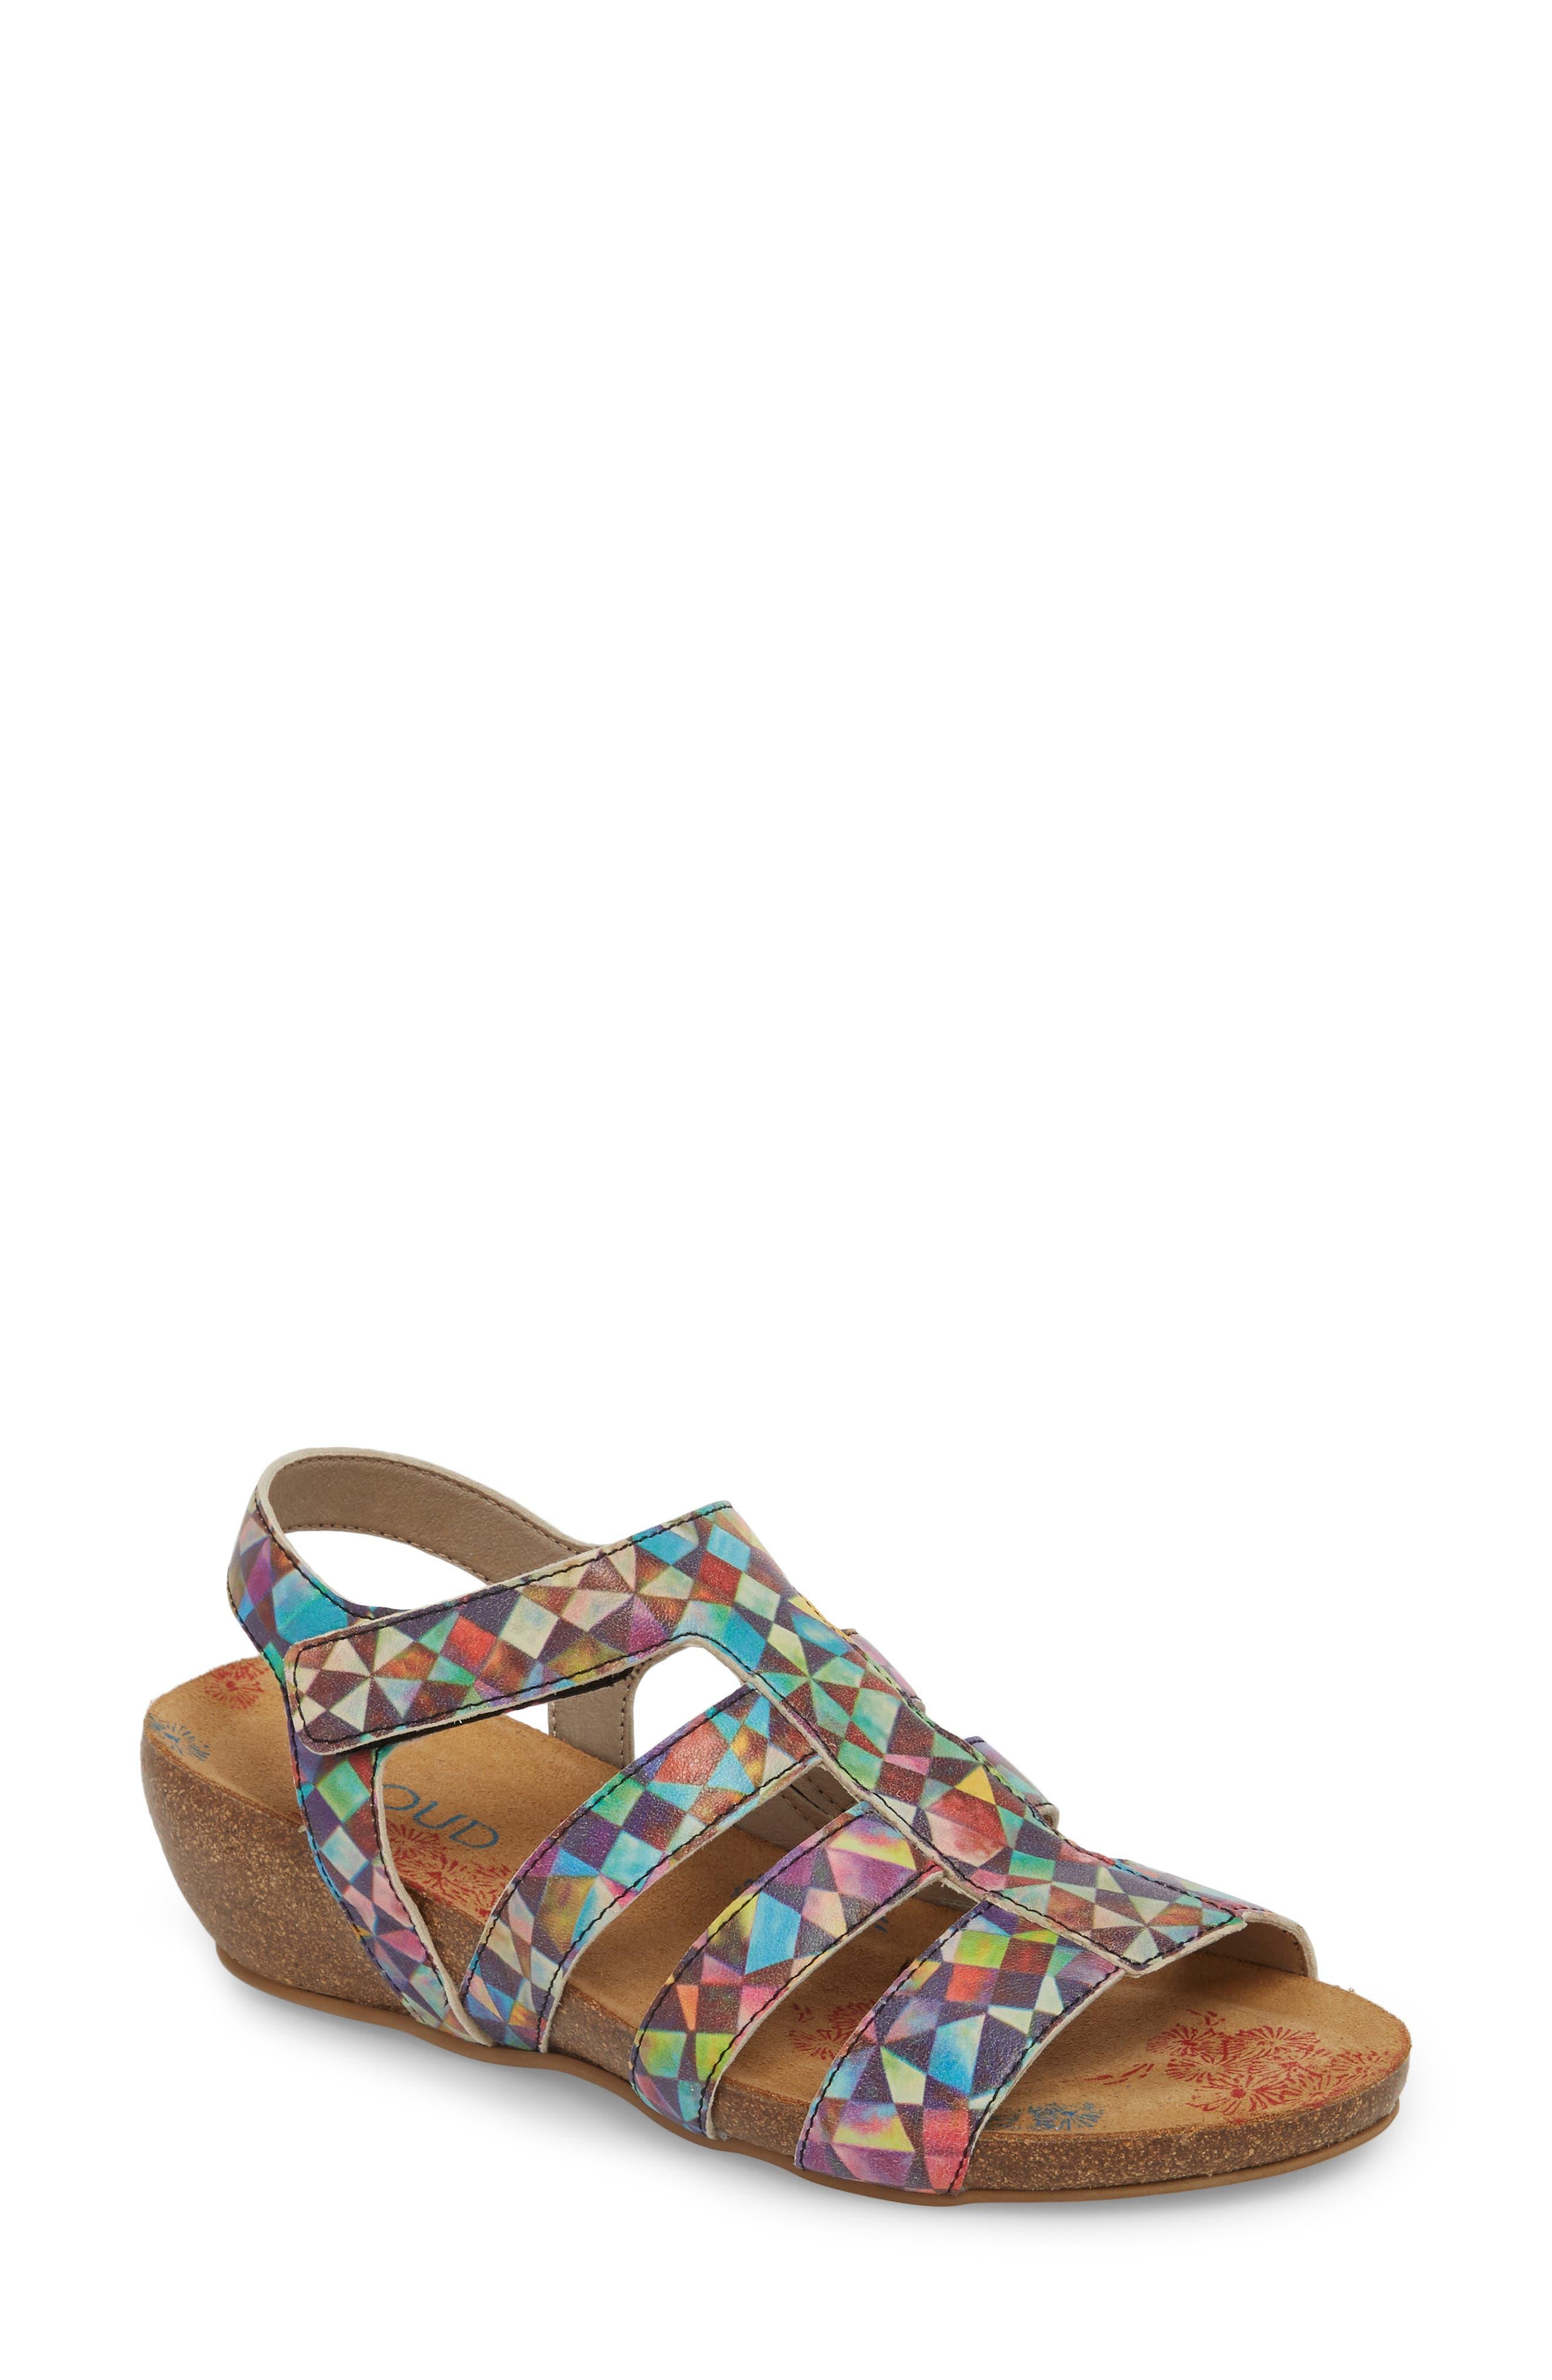 Delta Wedge Sandal,                         Main,                         color, 500